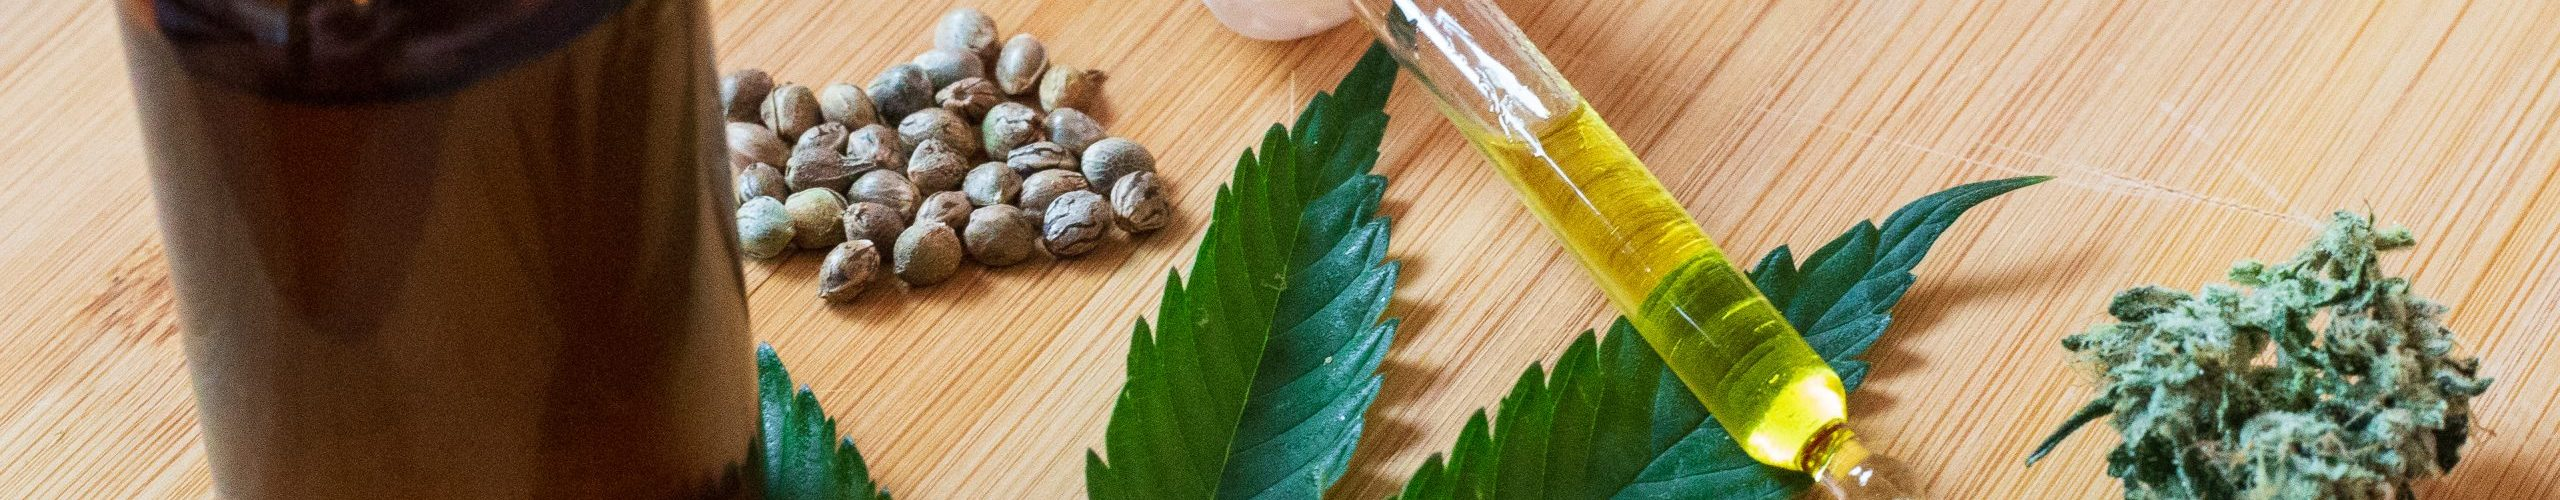 cannabis oil germany